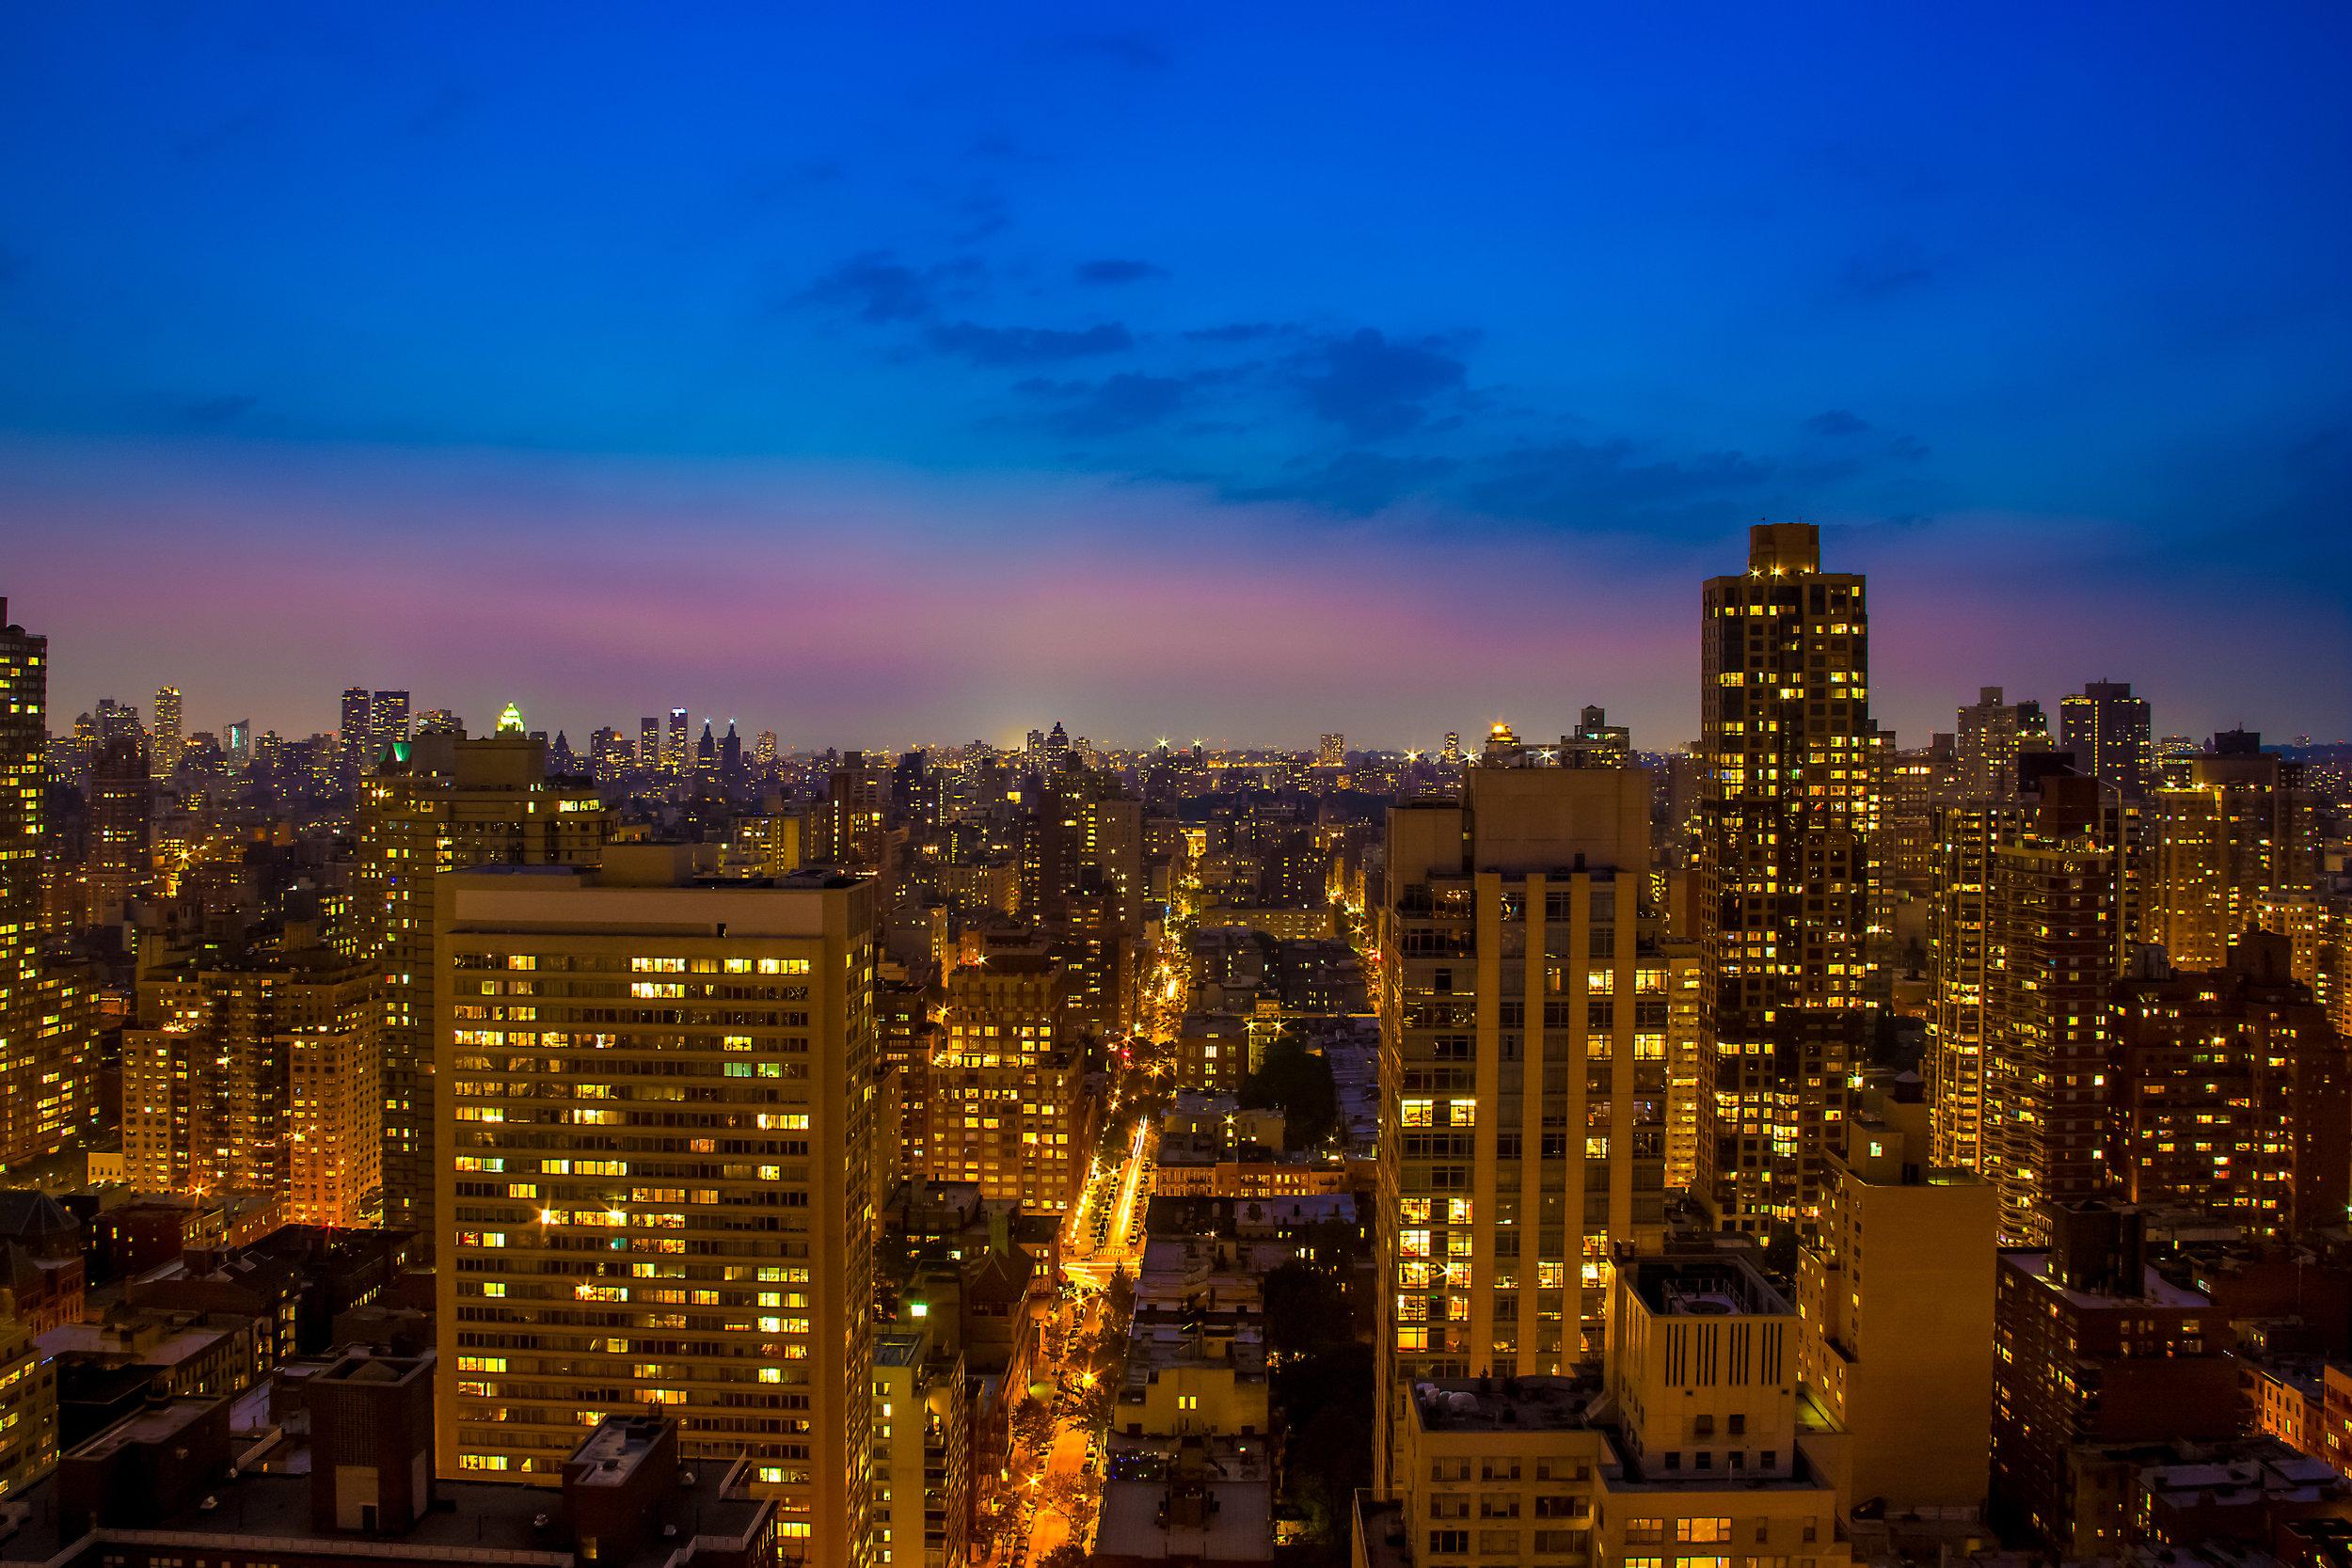 LSNY_Night_City_Views-14.jpg